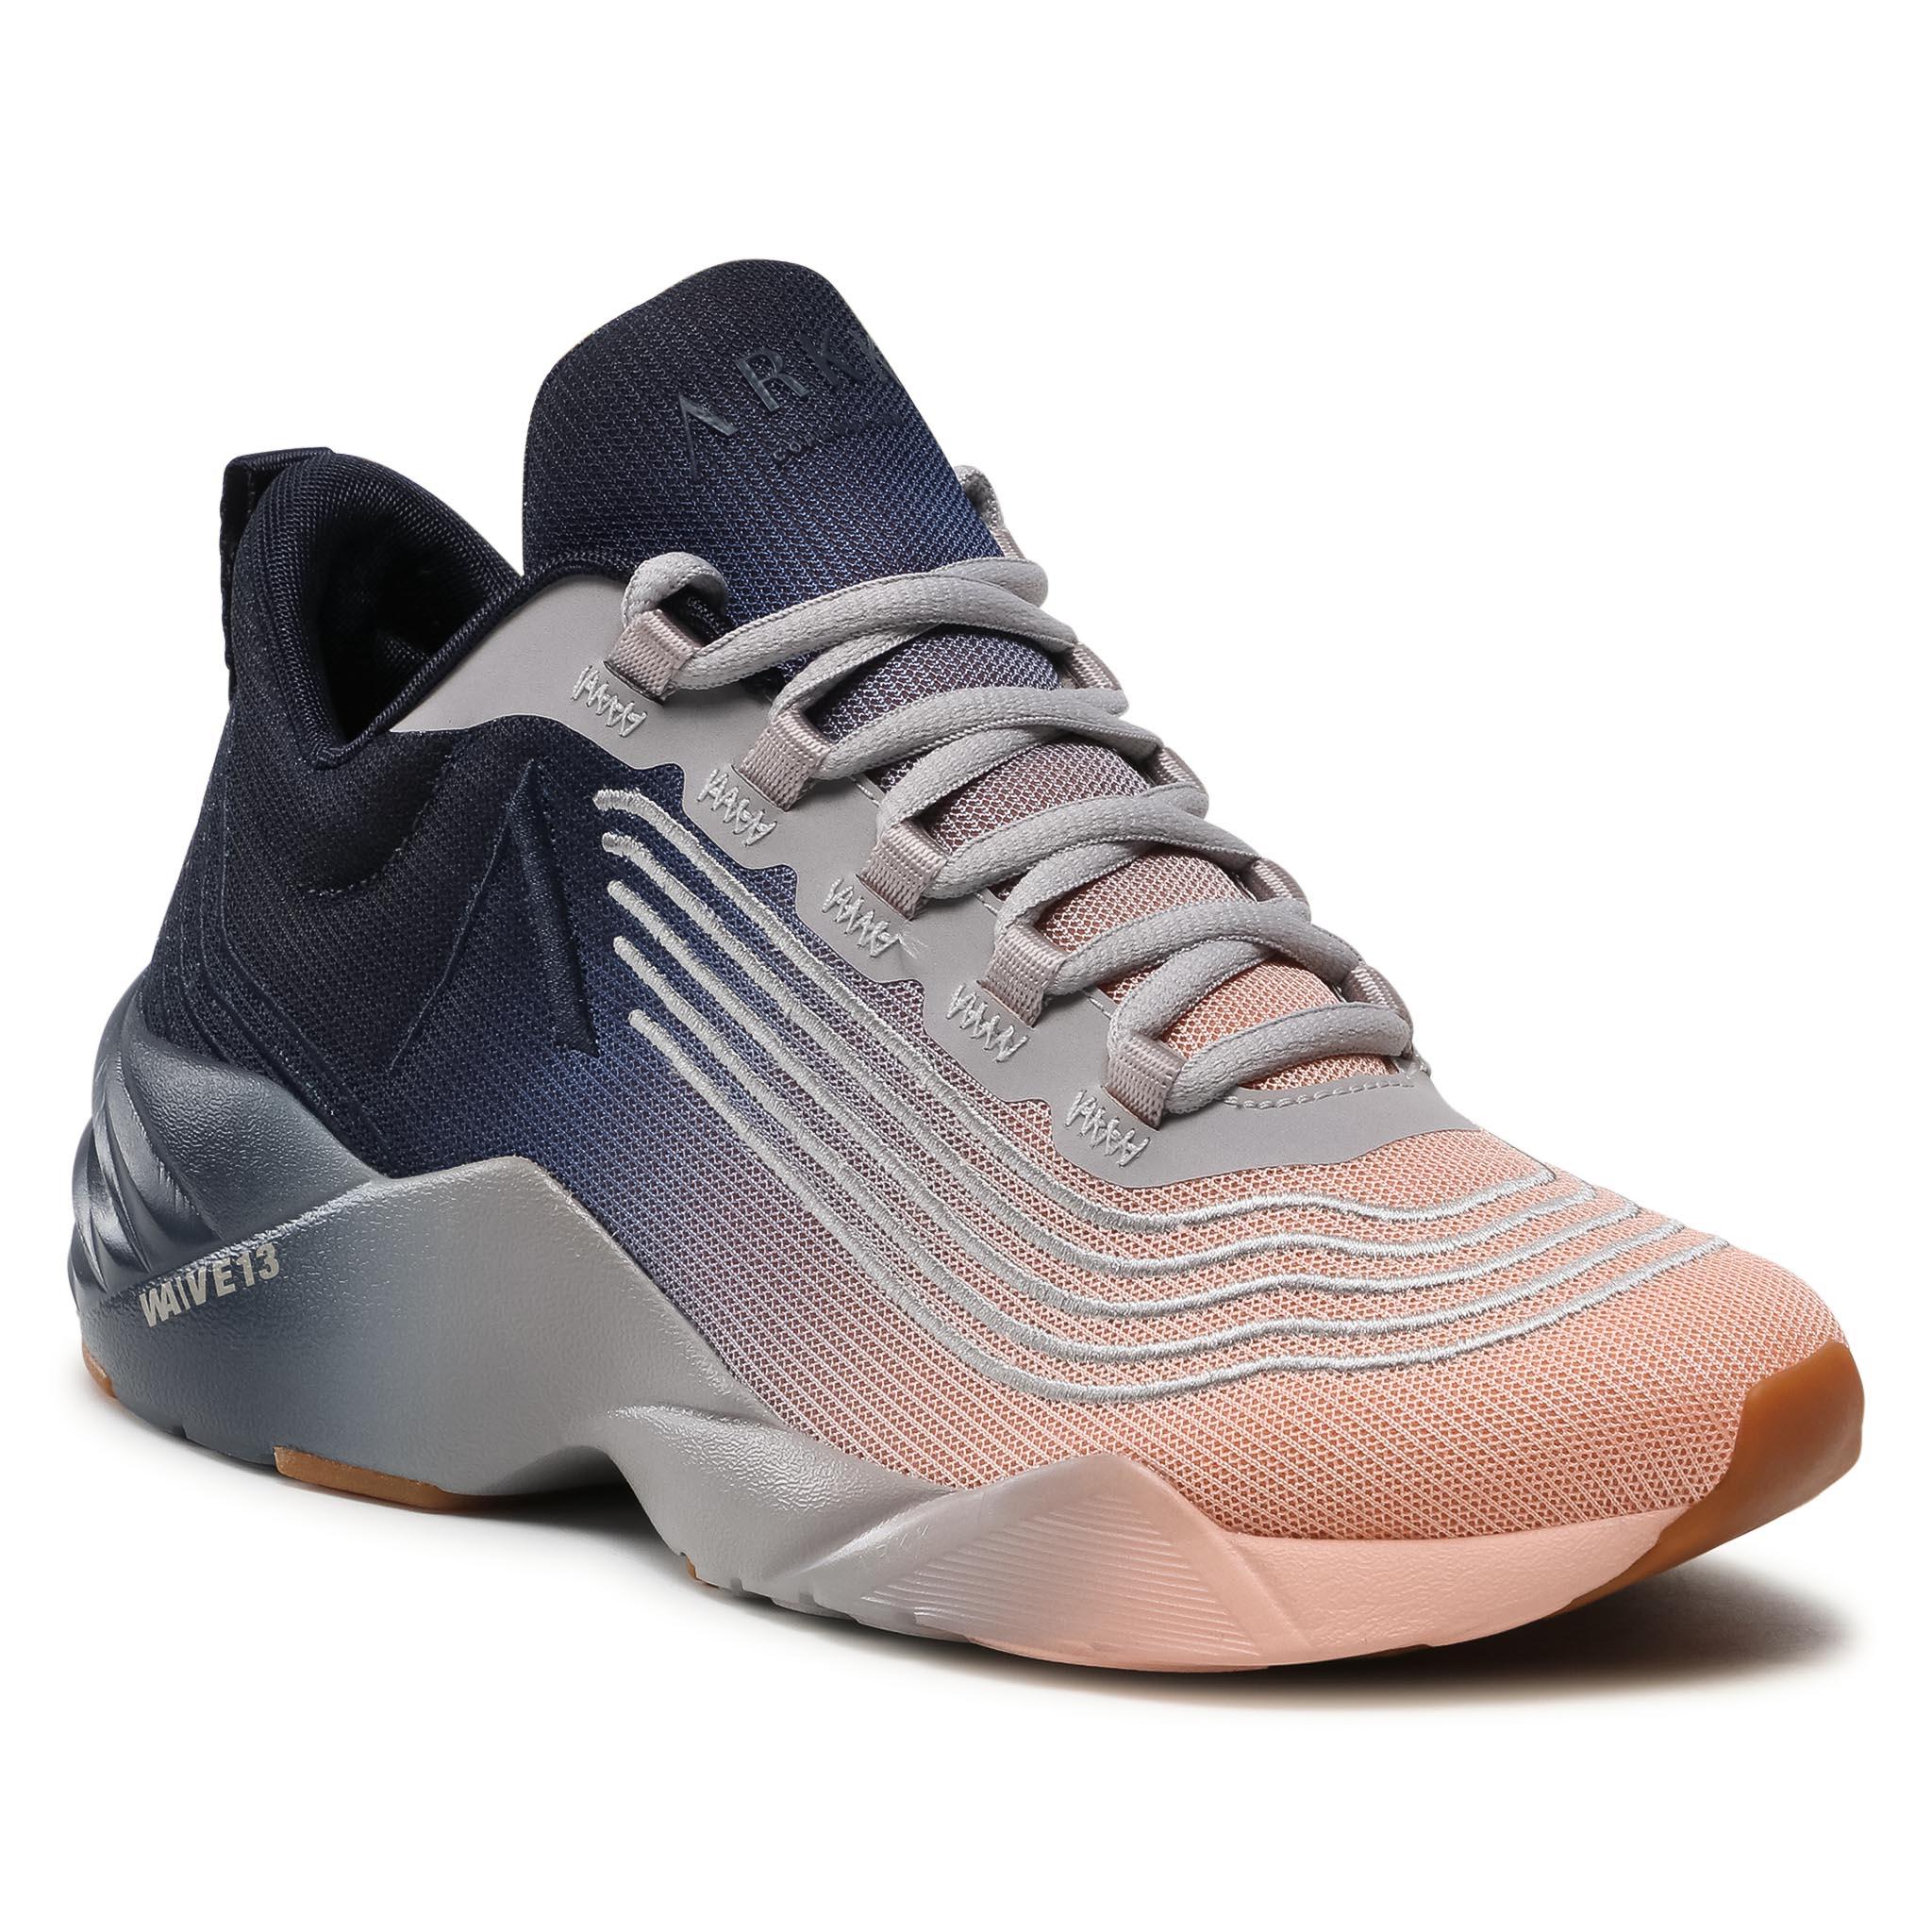 Image of Sneakers ARKK COPENHAGEN - Avory Mesh W13 CO4906-0052-W Soft Peach Midnight Gum